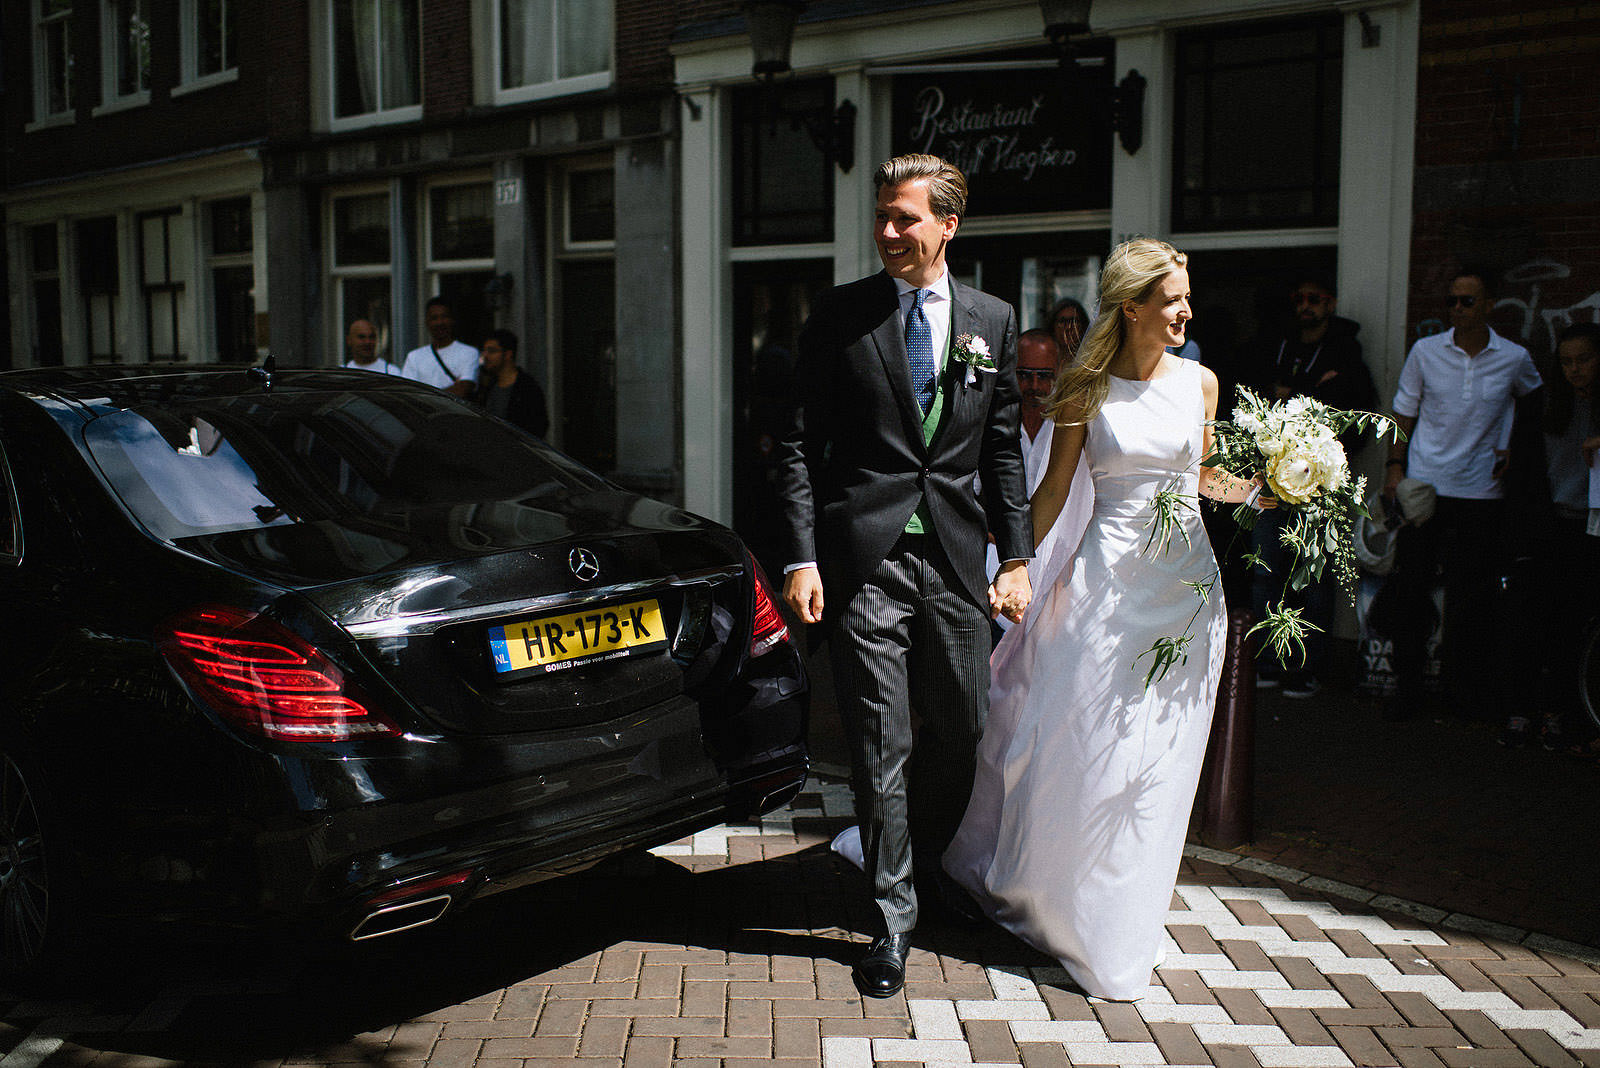 Fotograf Konstanz - Destination Wedding Photographer Amsterdam 048 - Destination Wedding Amsterdam  - 157 -